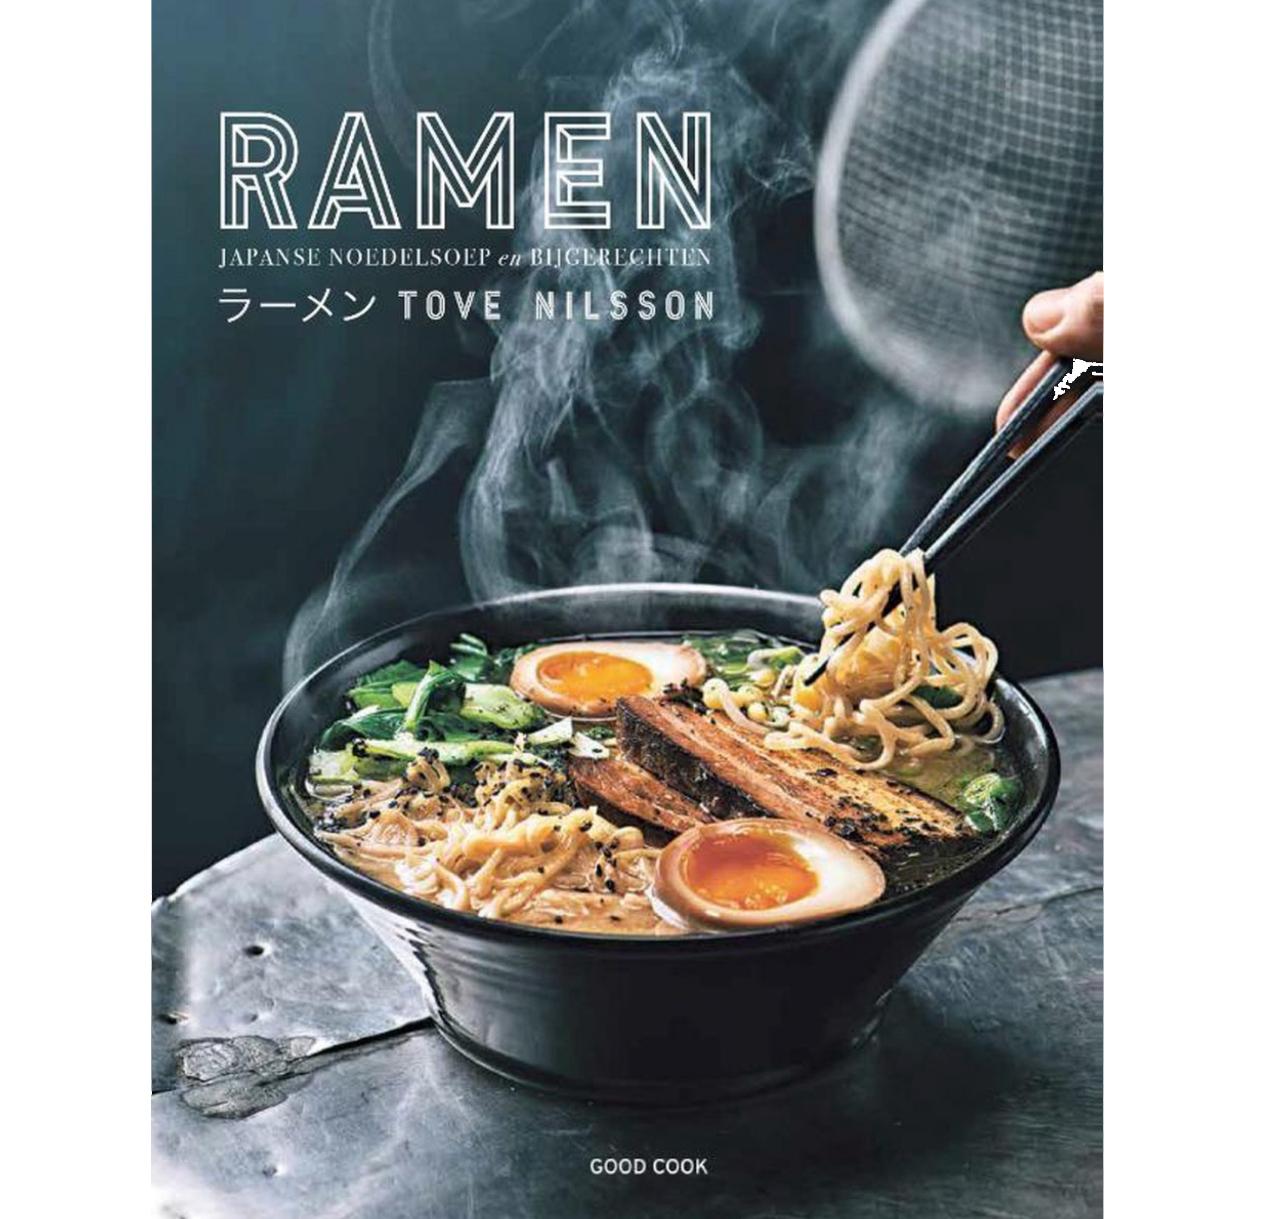 Ramen Japans kookboek